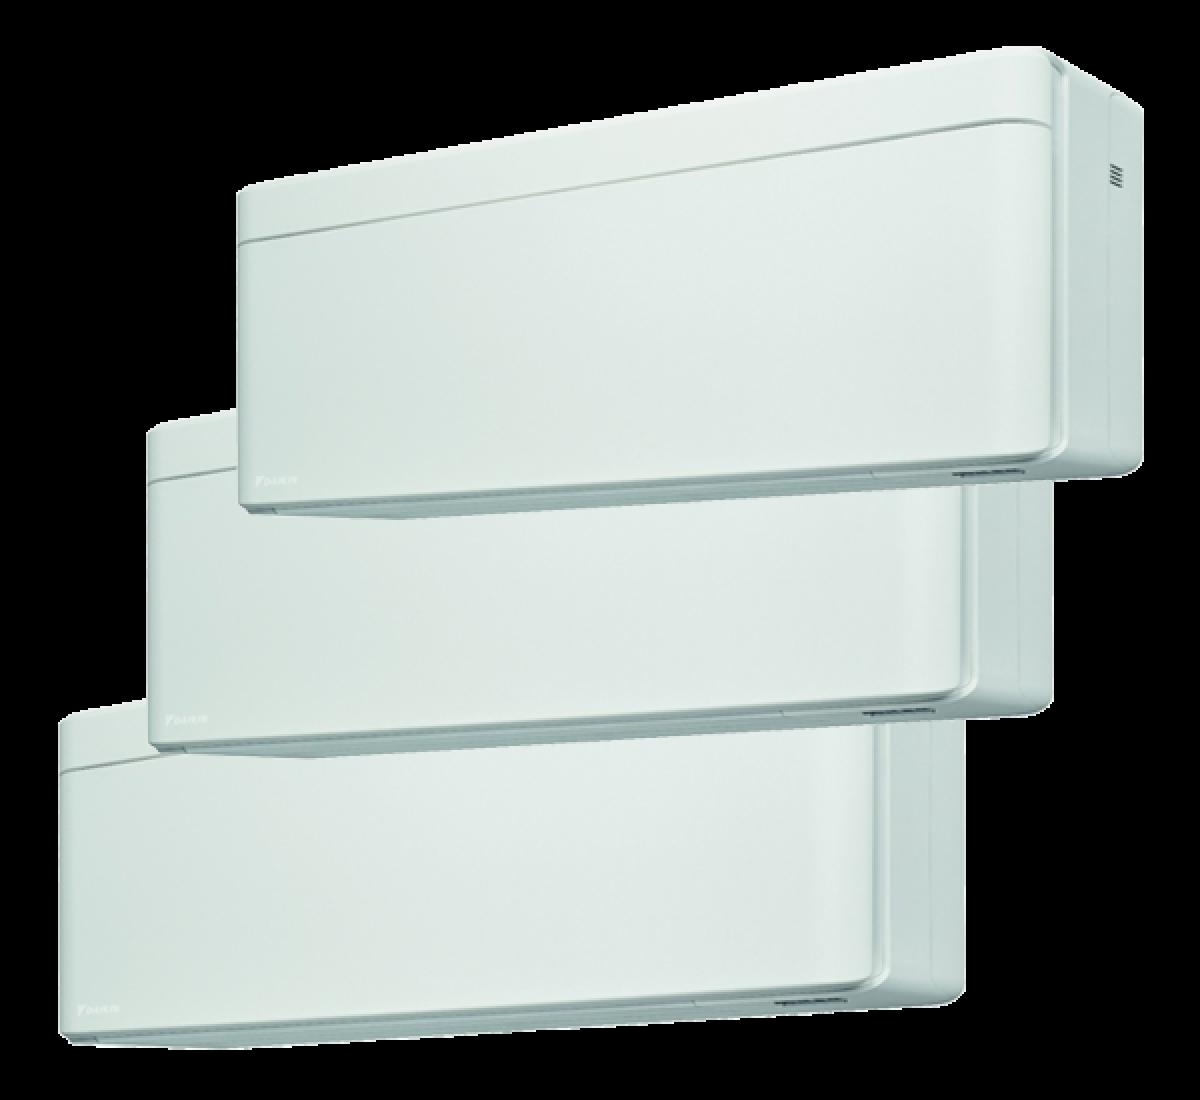 Multisplit Aire Acondicionado Equipo Interior Daikin Serie Comfora FTXA35-AW-FTXA35-AW-FTXA25-AW